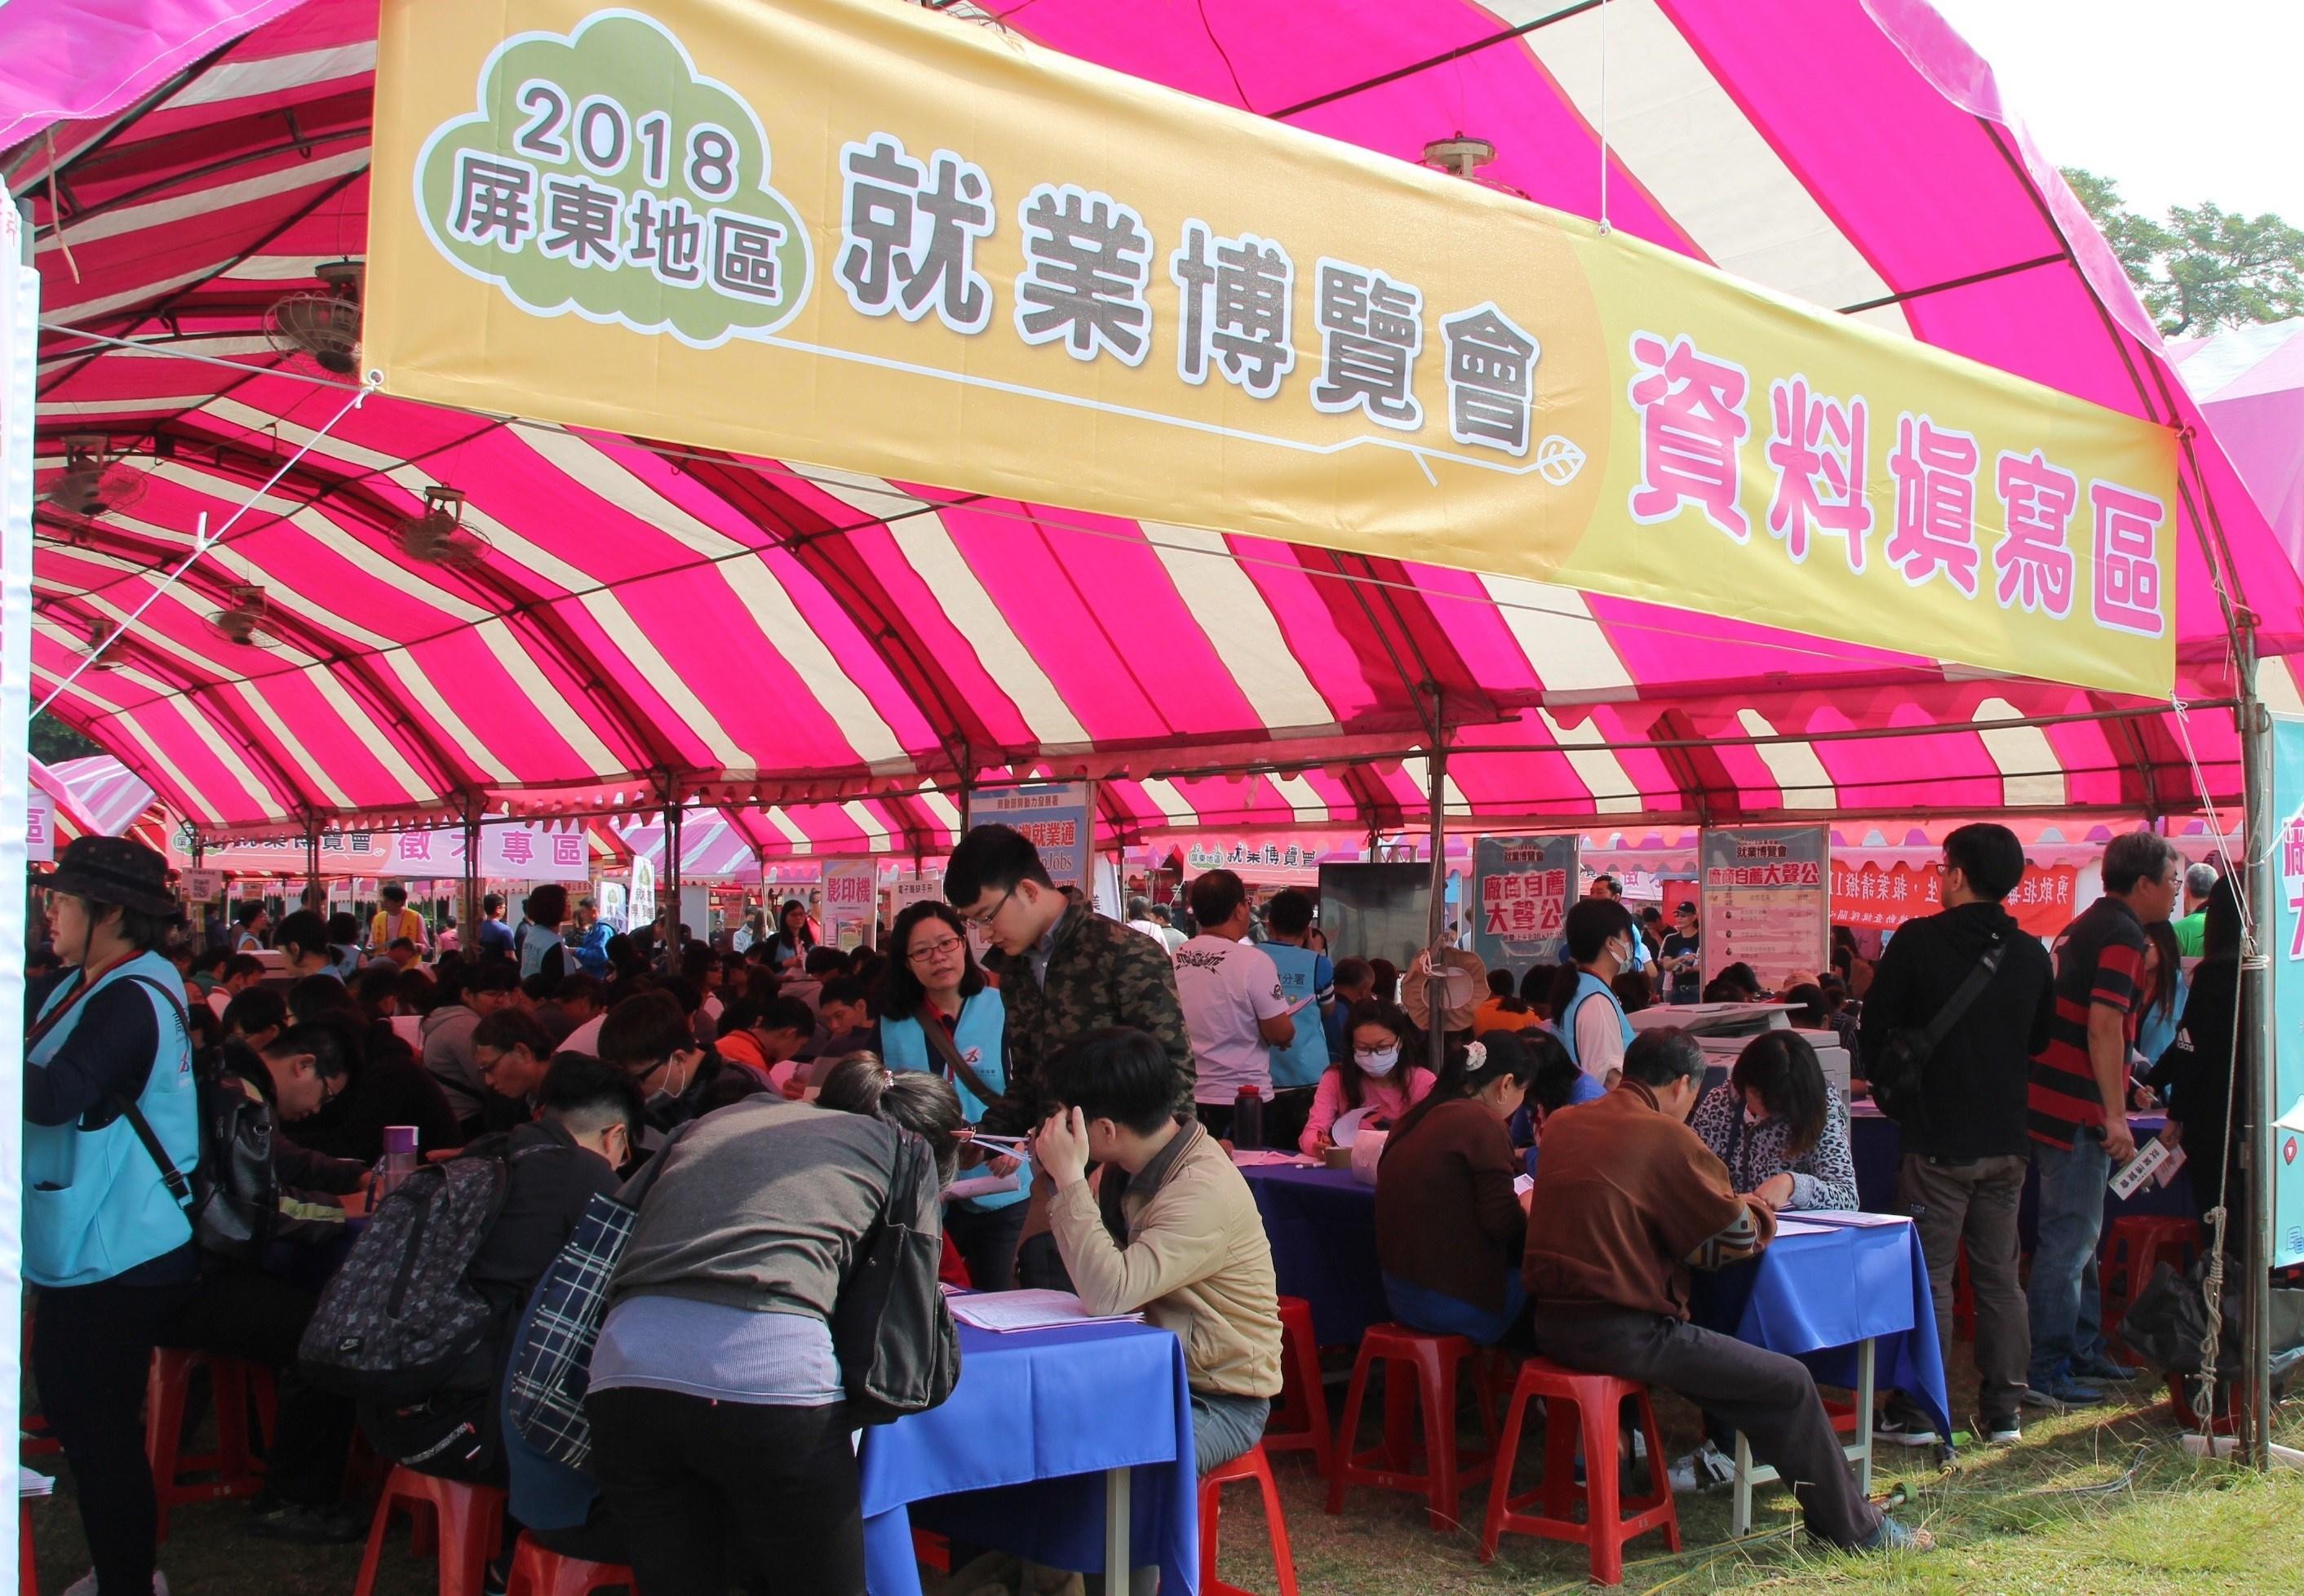 Job seekers at the 2018 Kaohsiung-Pingtung-Penghu-Taitung Job Fair